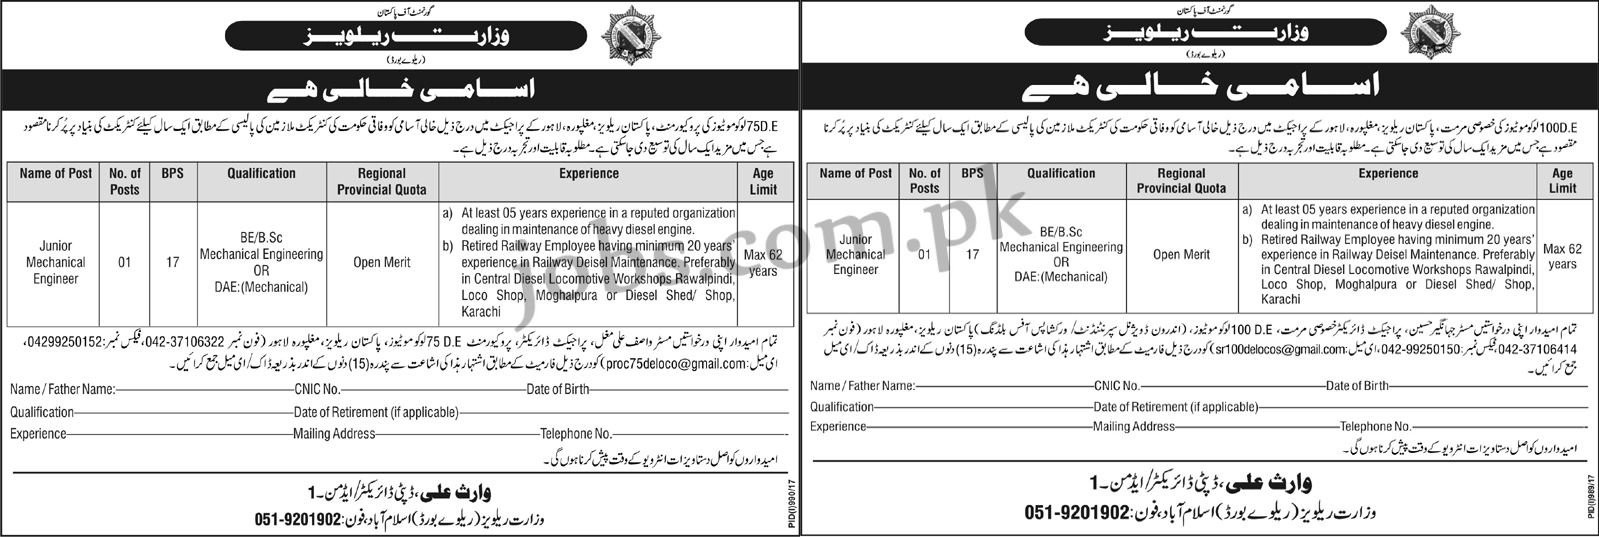 pakistan railway jobs application form 2017